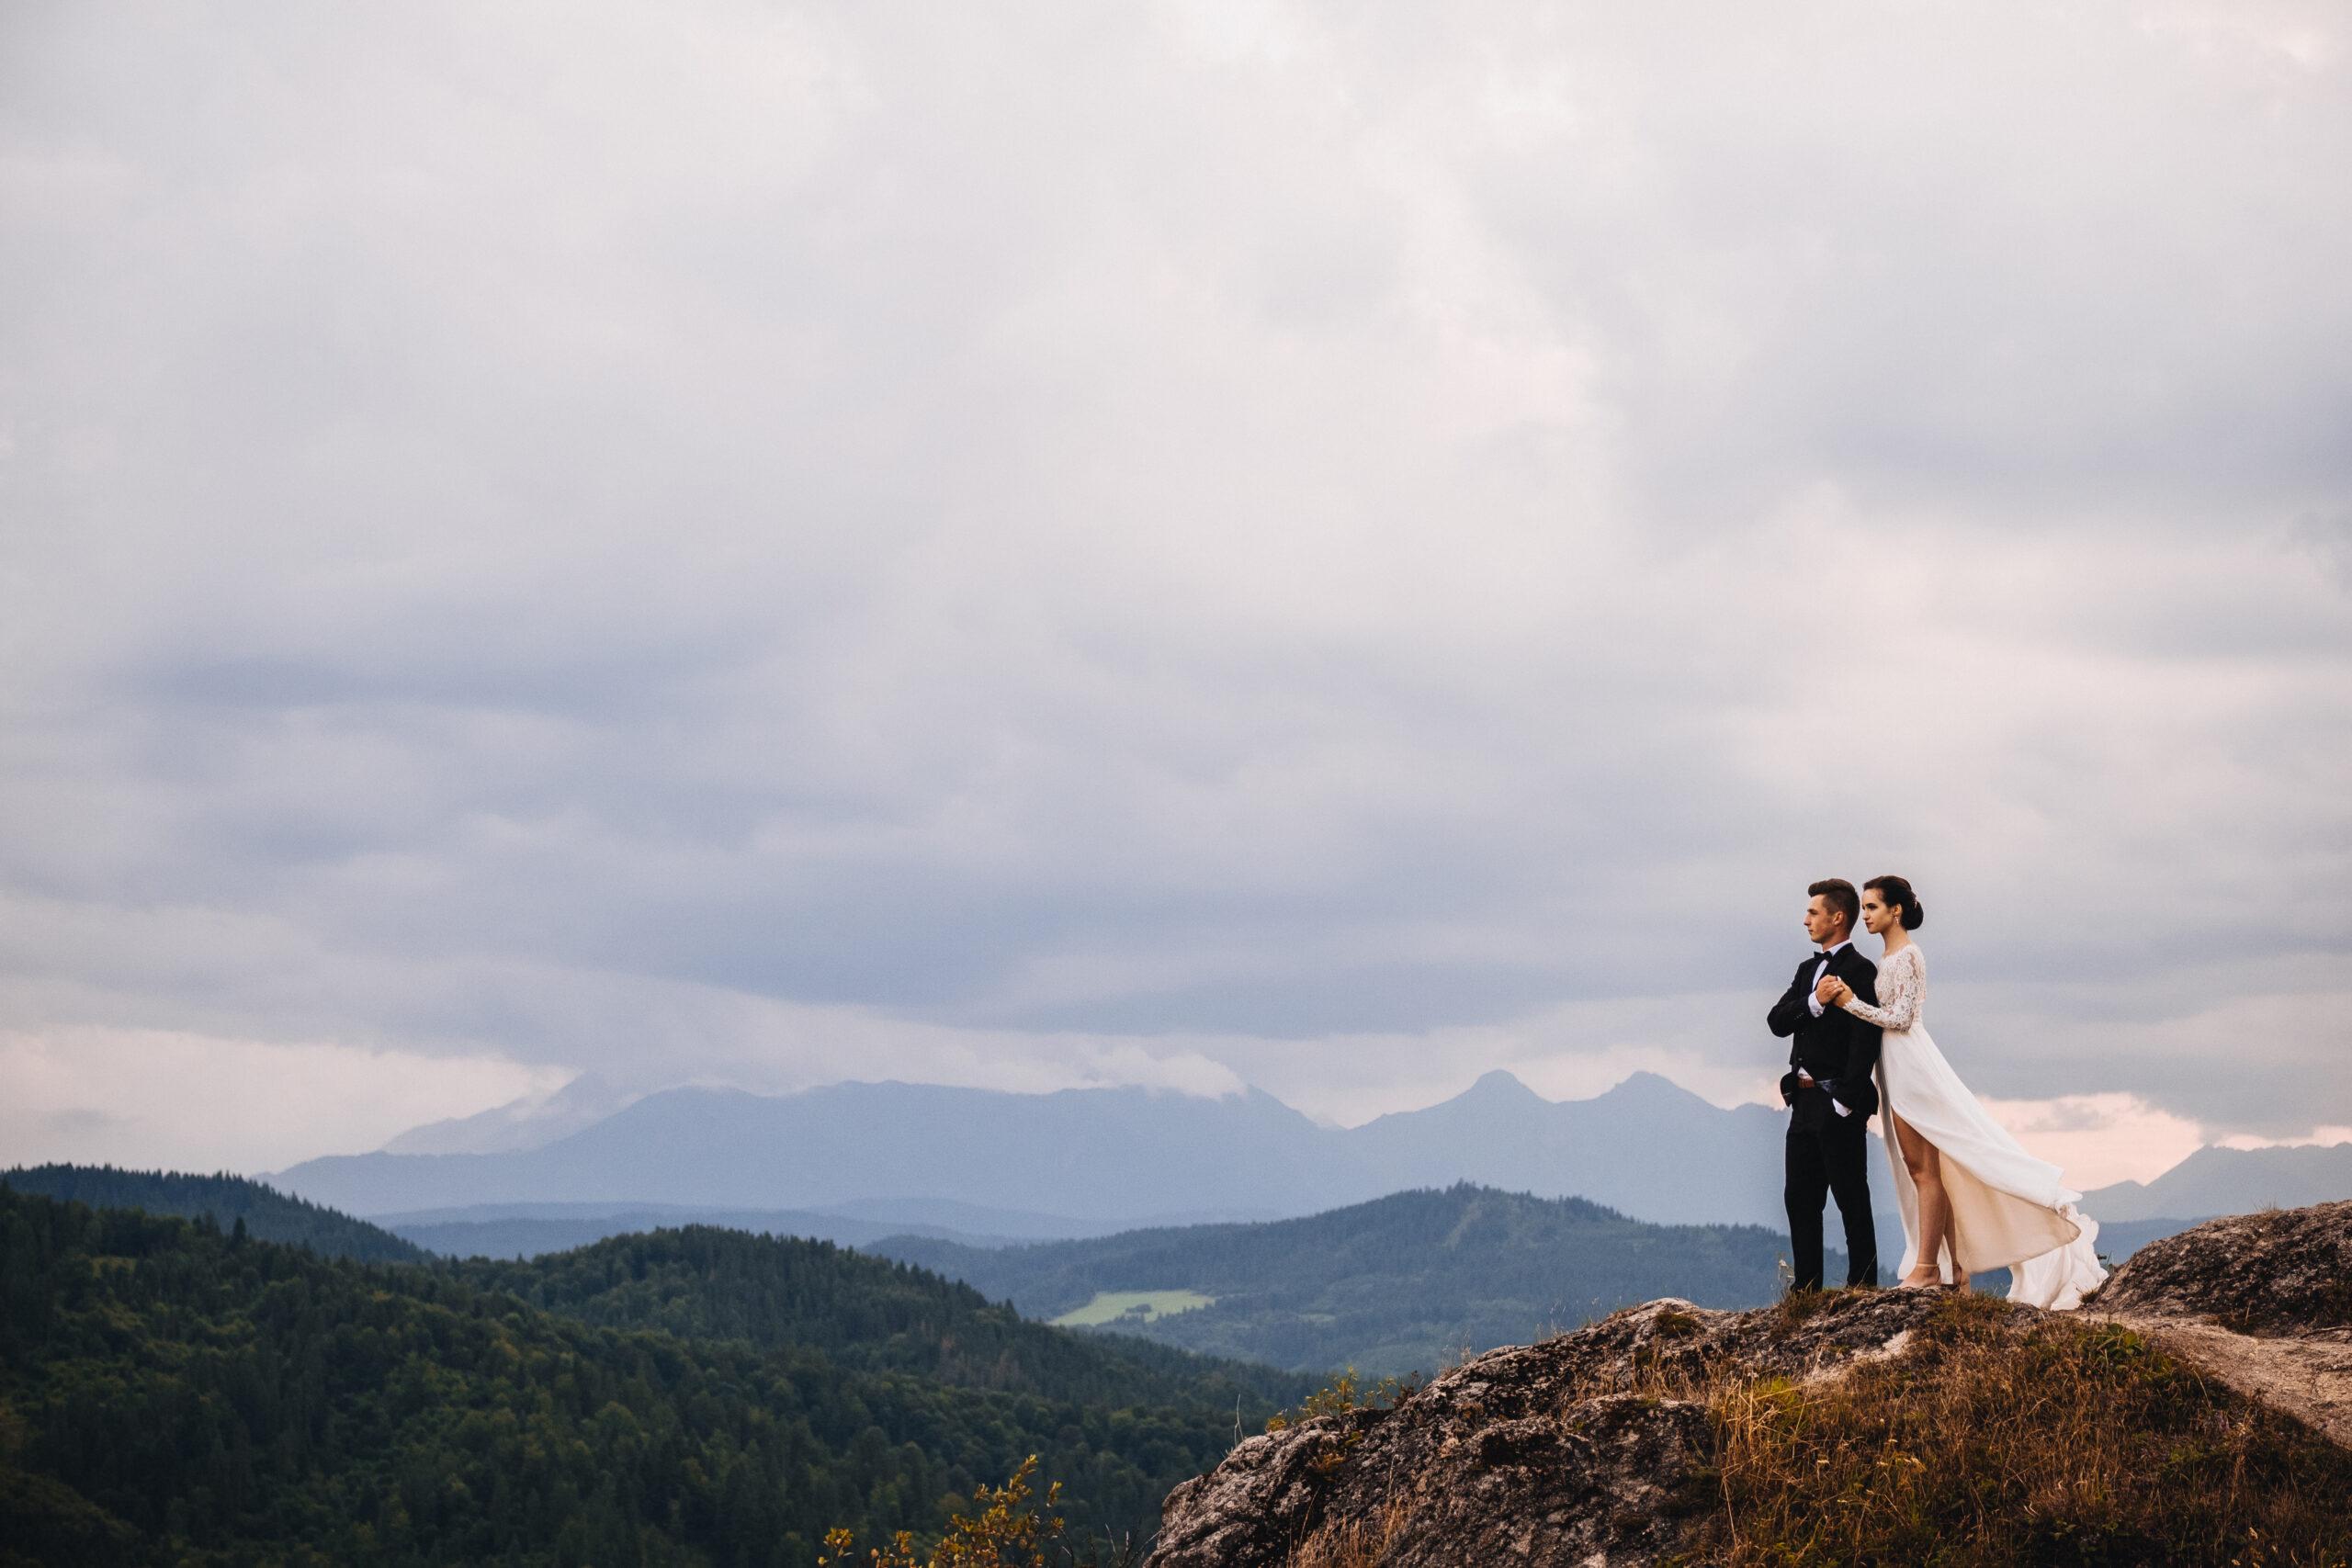 Ślub w górach 15